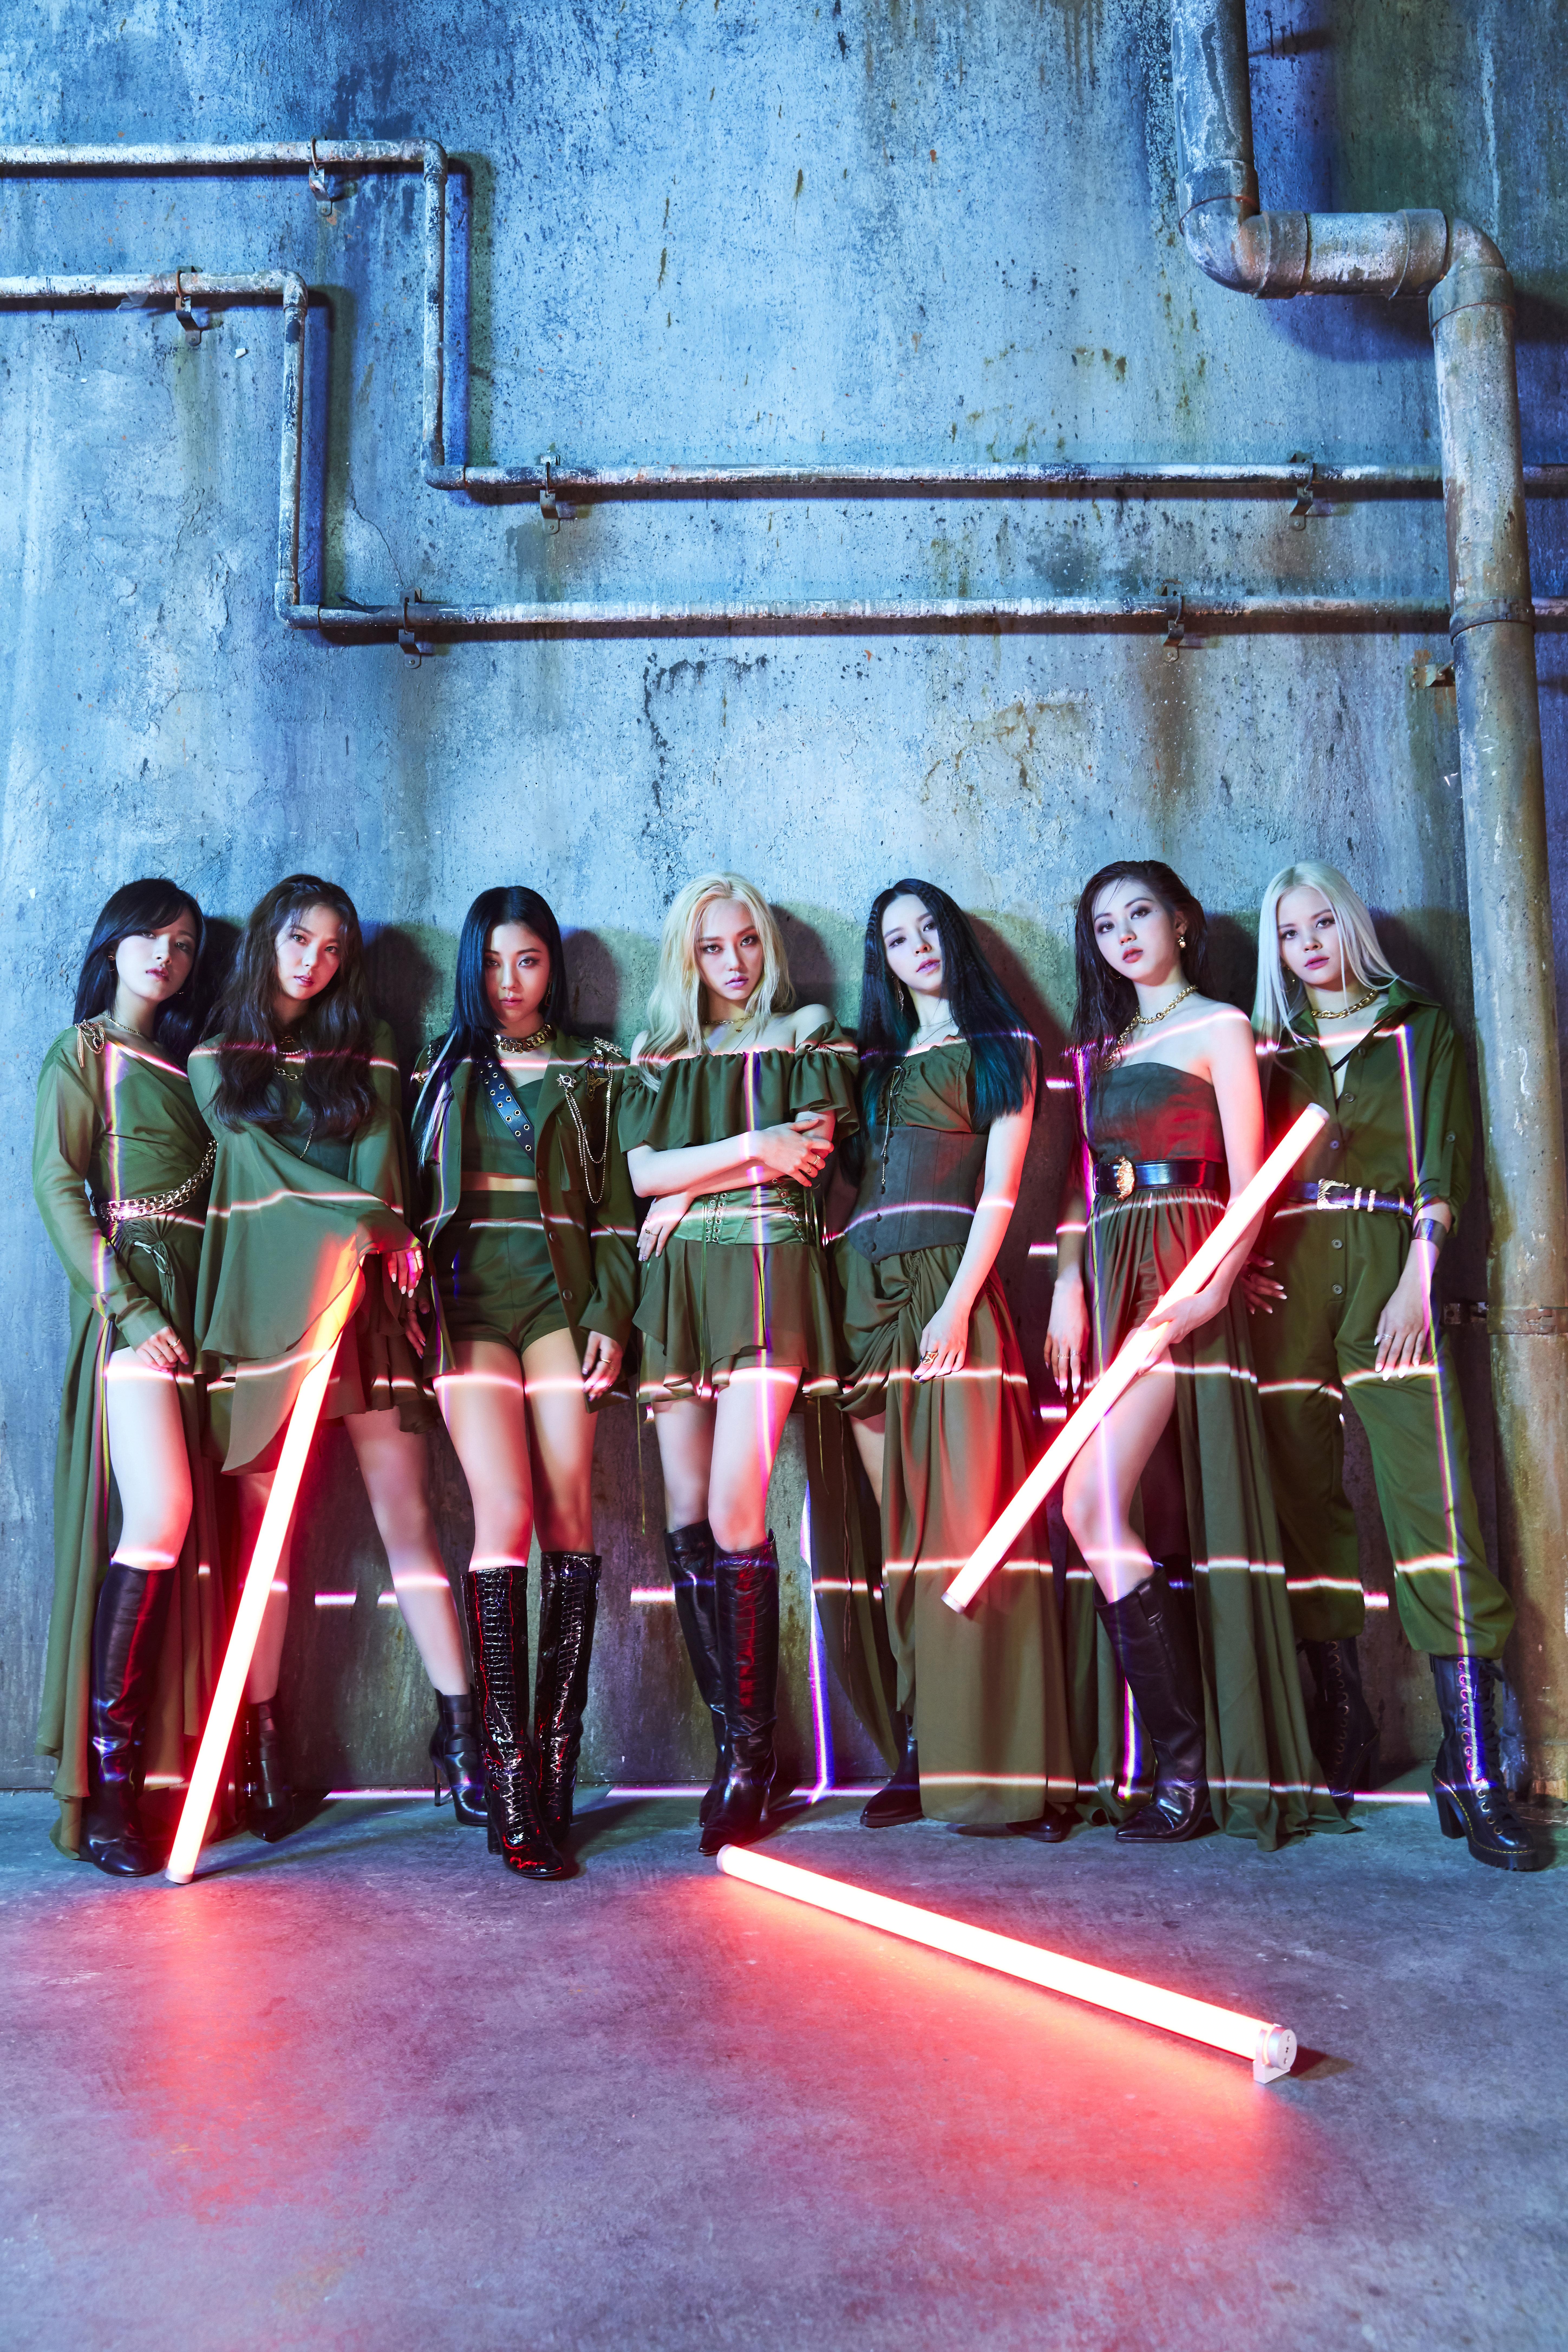 "Clc Profile ̔¨ì—˜ì""¨ K Pop Database Dbkpop Com Taehyung, yunsuk, jonghyuk, sanghyuk, hyungon, hoseok, minhyuk. clc profile 씨엘씨 k pop database dbkpop com"